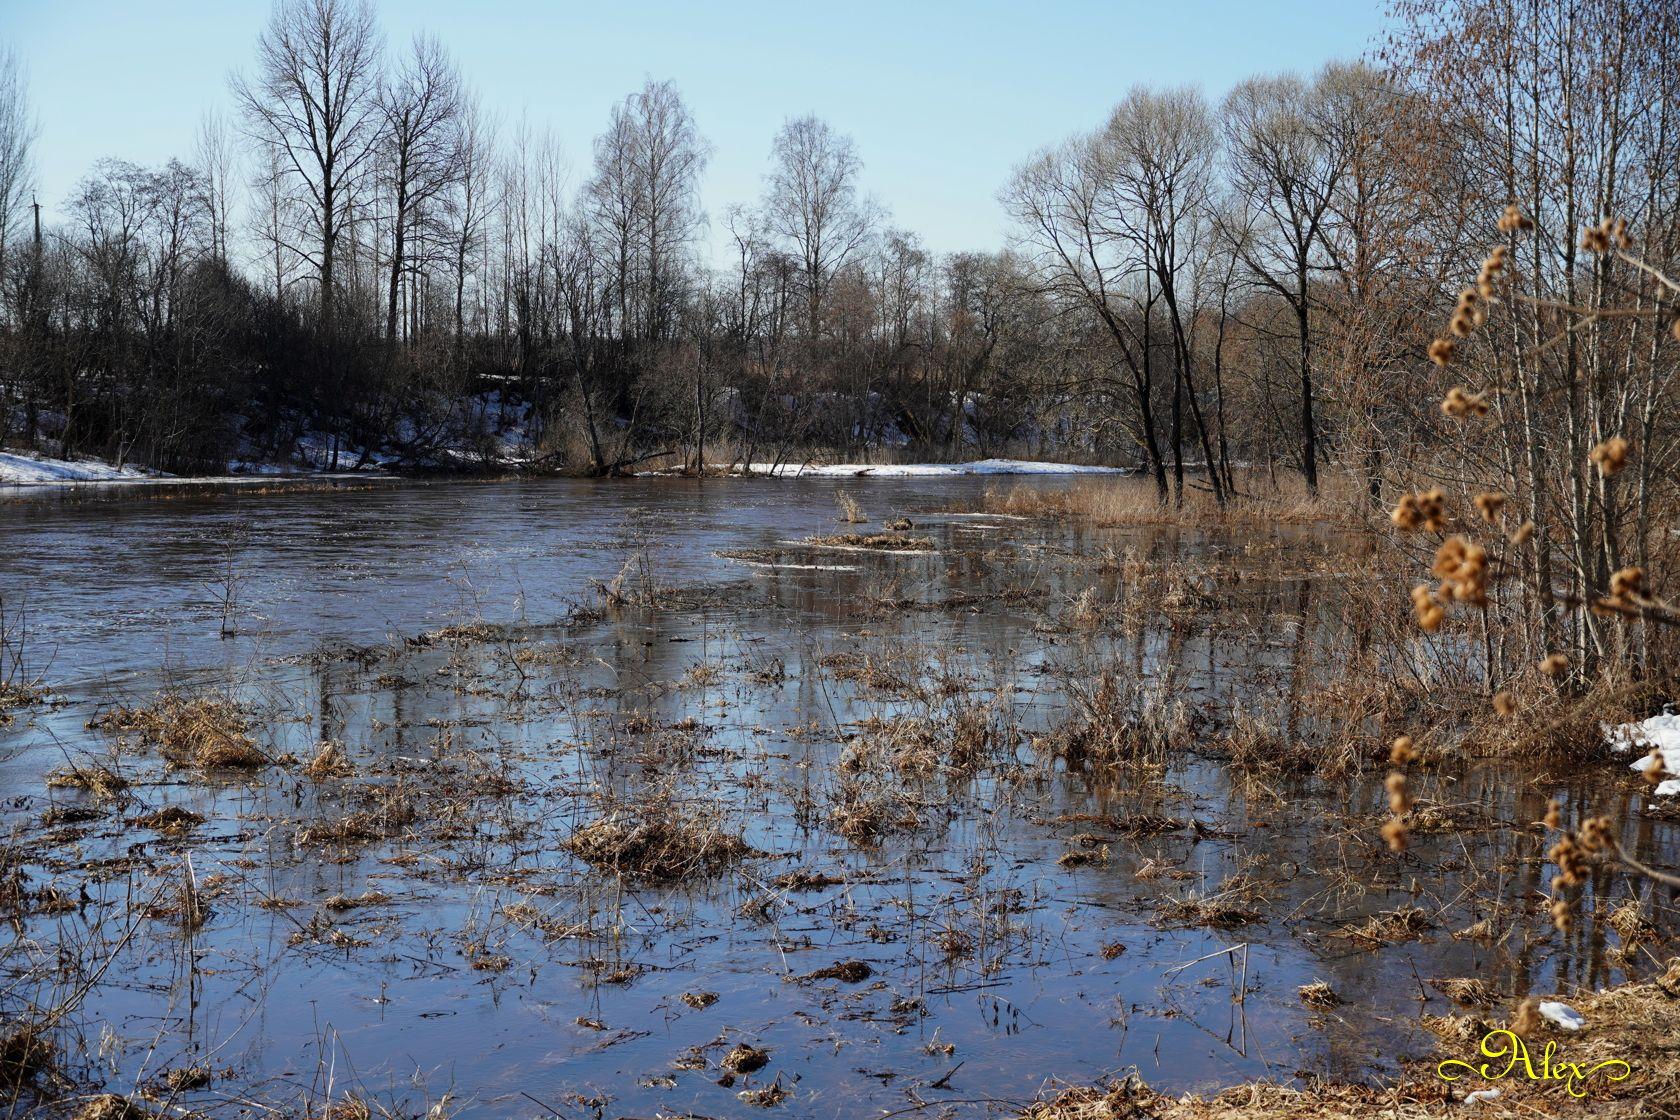 Река в марте река весна март утро природа пейзаж